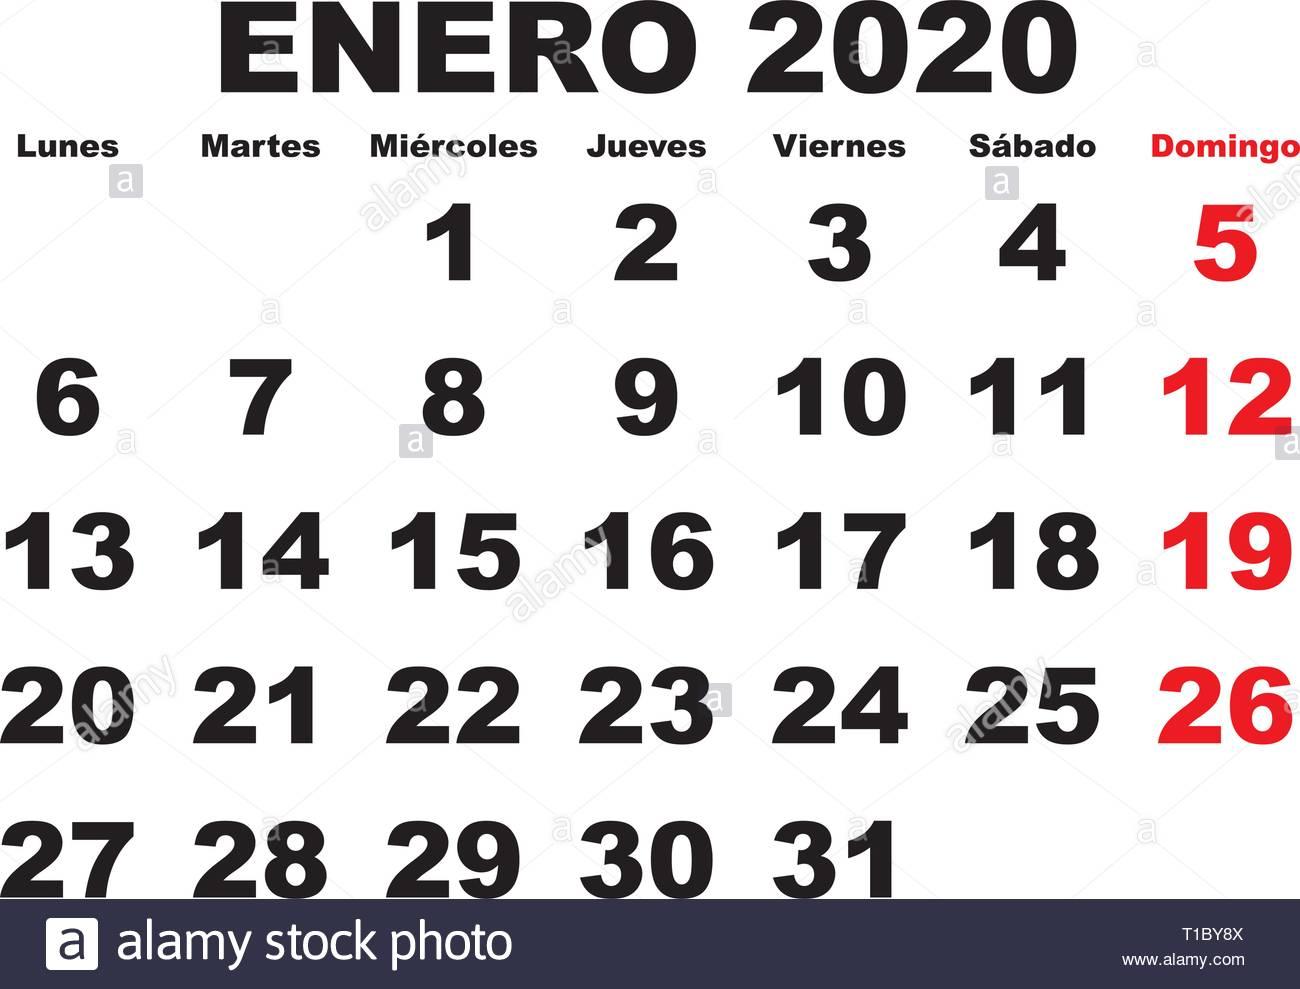 Imprimir Calendario 2020 Por Meses.Vector De Calendario 2020 Vectores Imagenes De Stock Vector De